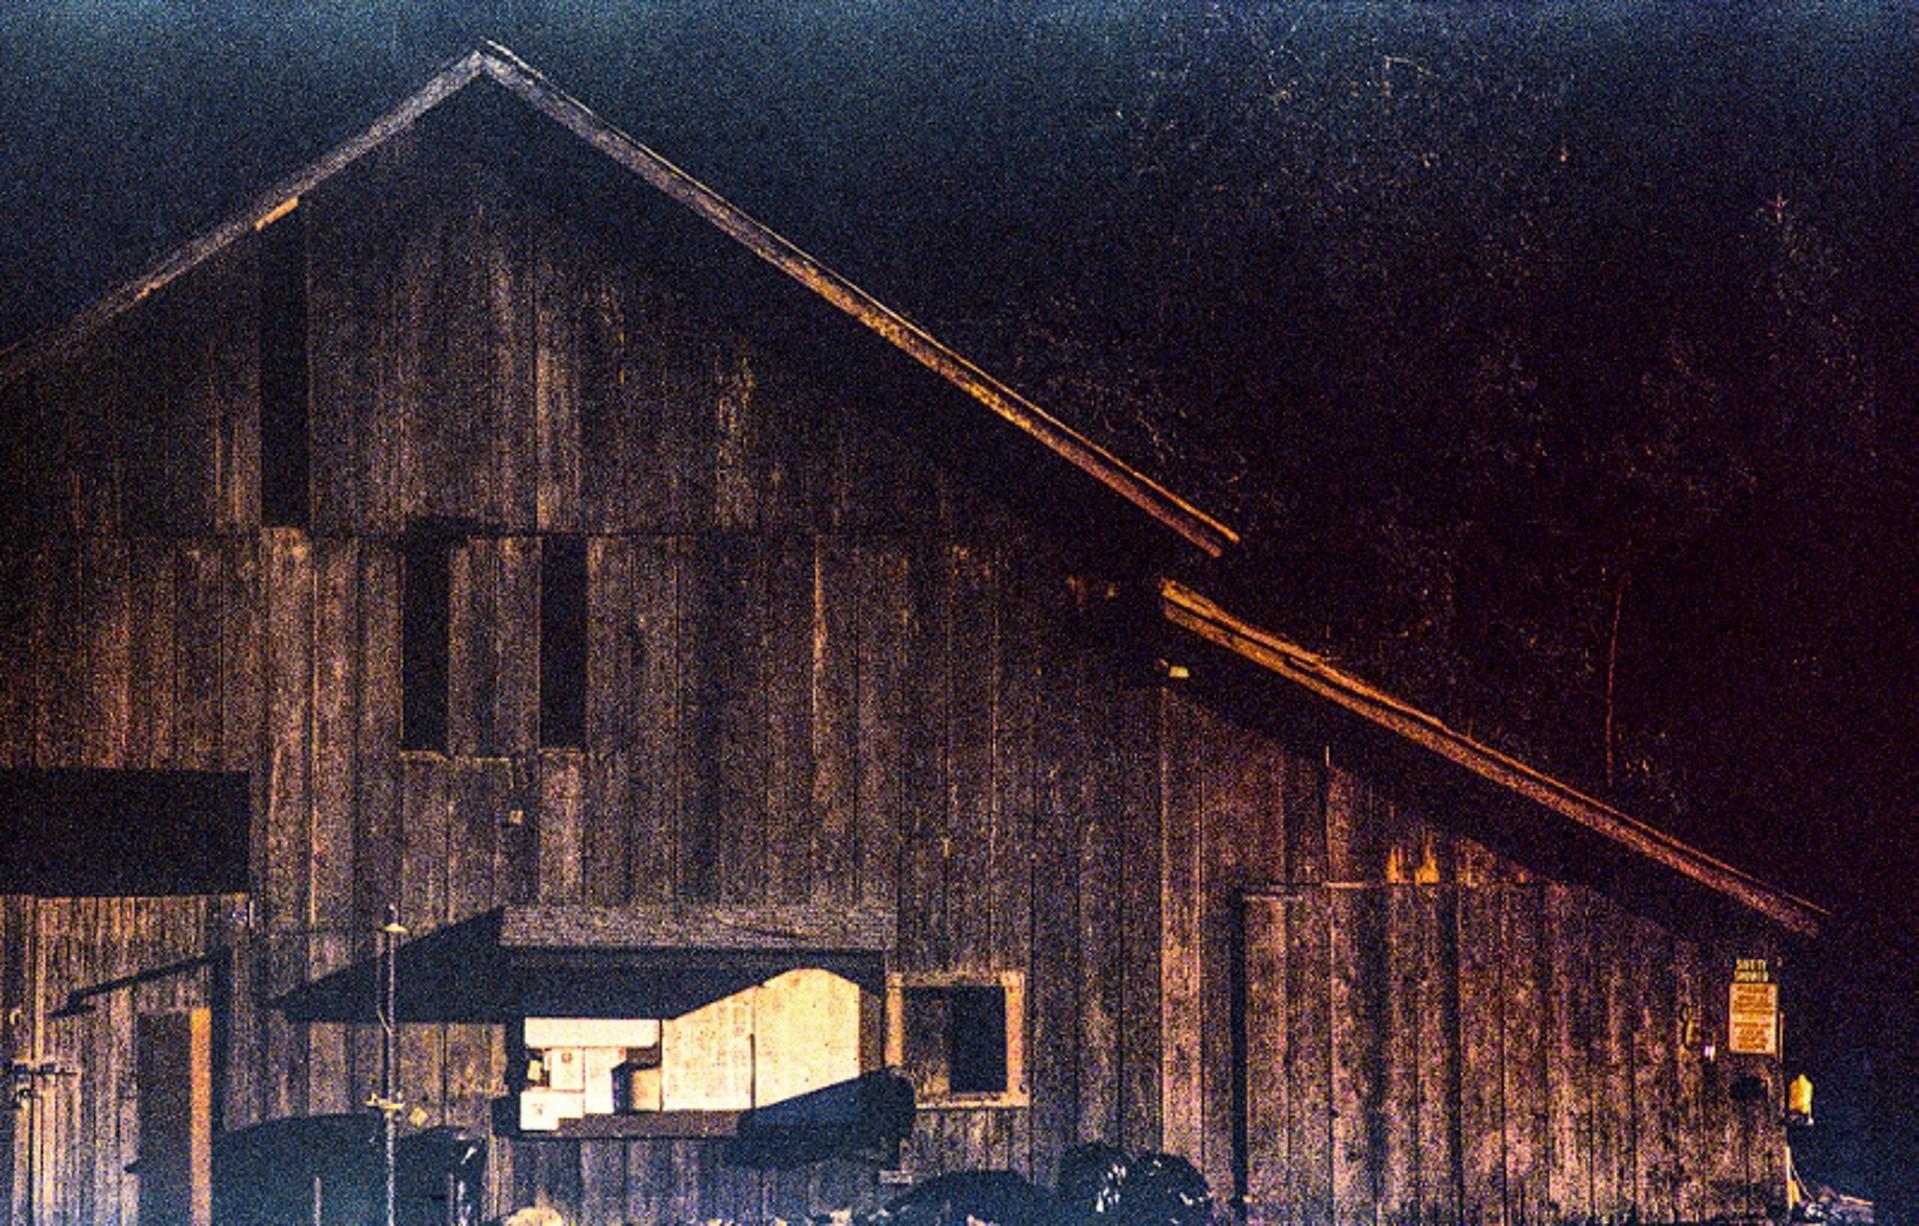 Barn at Sunset by Sam Aslanian